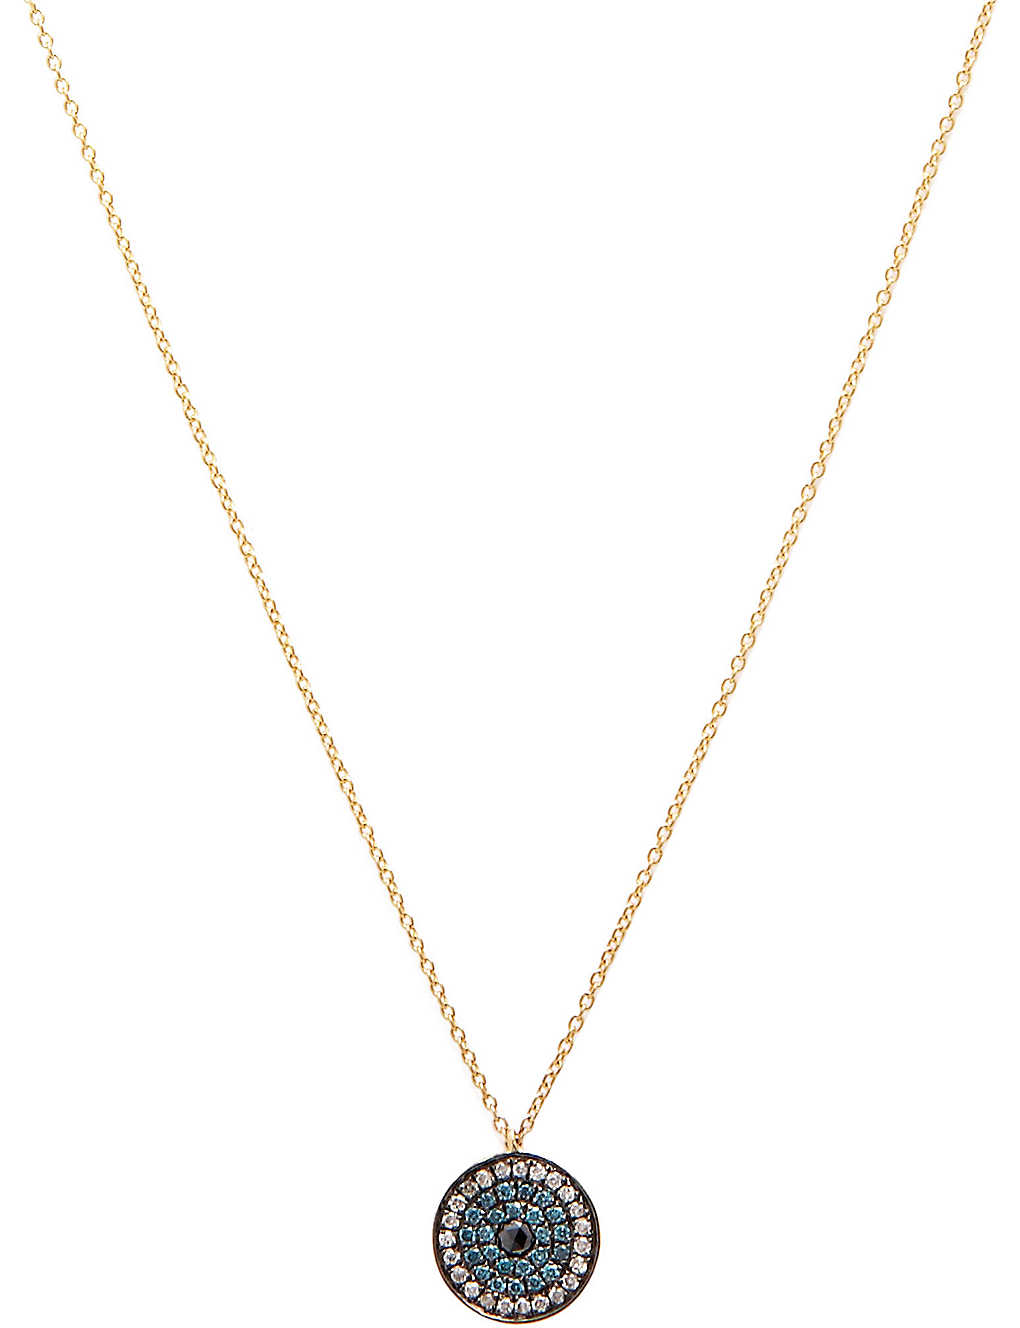 75369ac4f3776 Love Diamonds 18ct yellow-gold and diamond evil eye pendant necklace